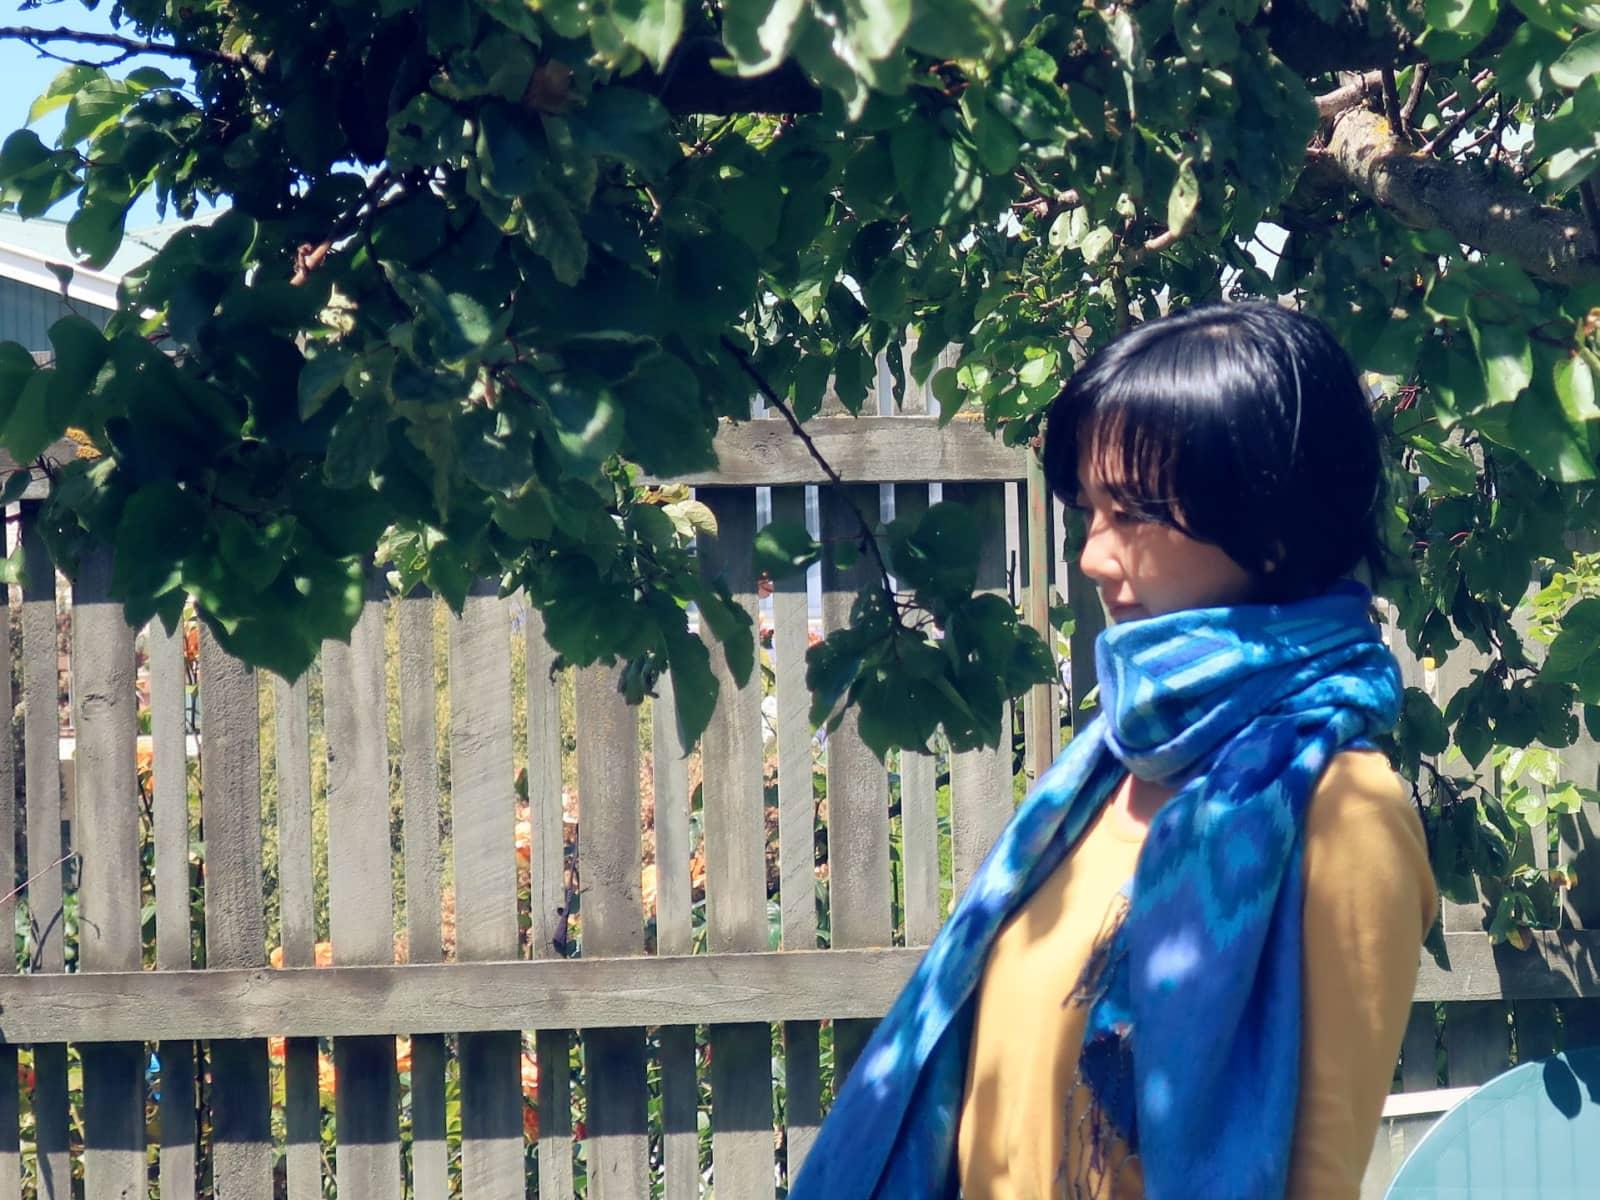 Mayumi from Poole, United Kingdom